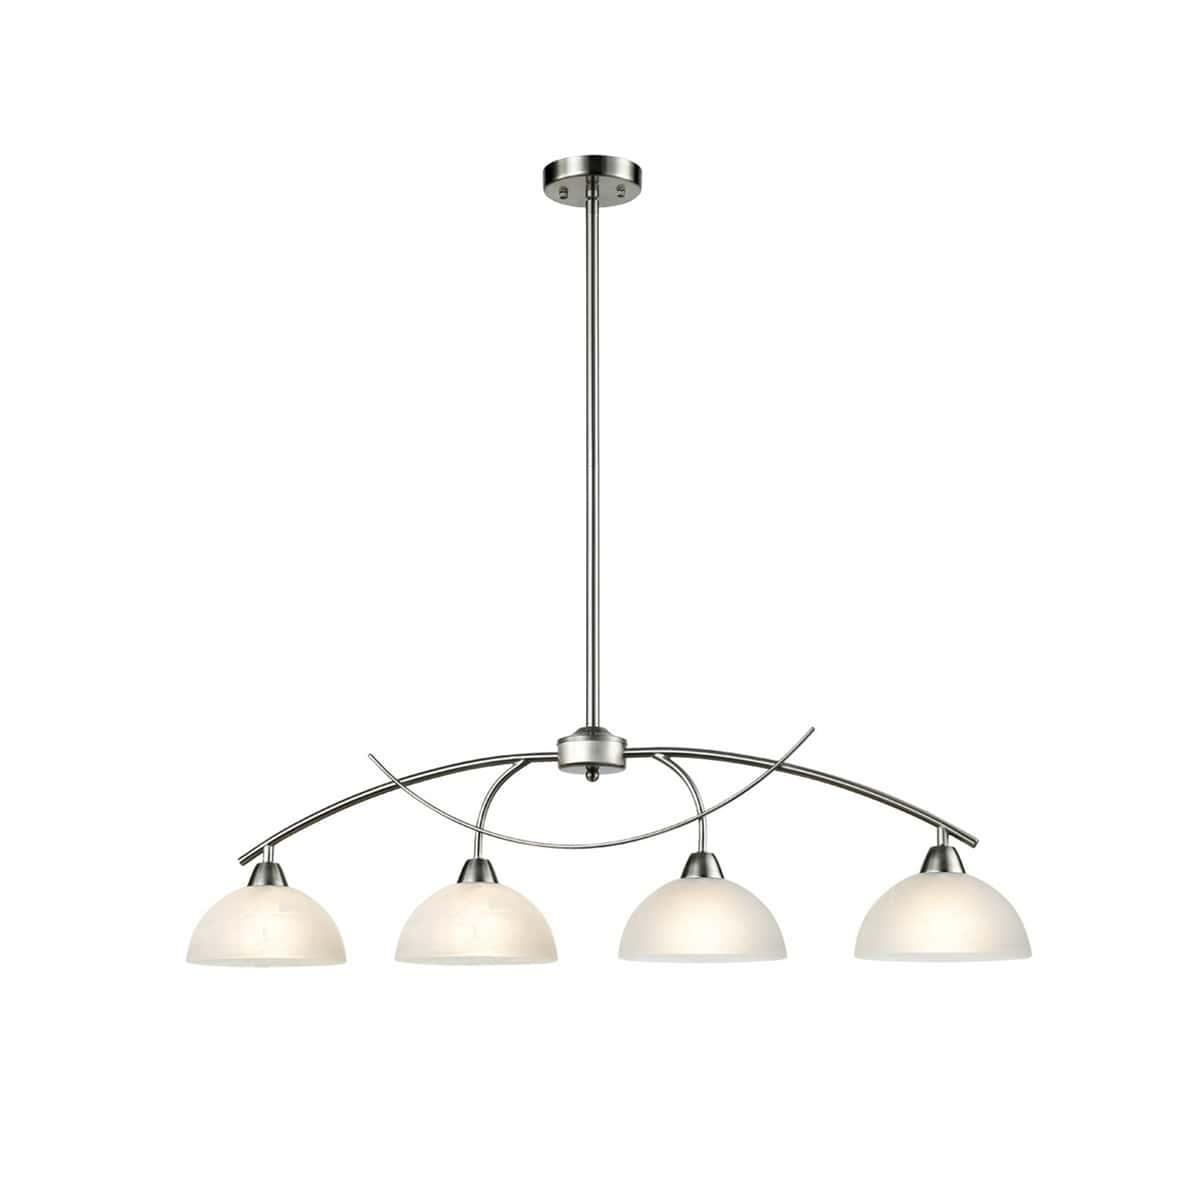 Arched 4-Light Brushed Nickel Kitchen Pendant Lighting